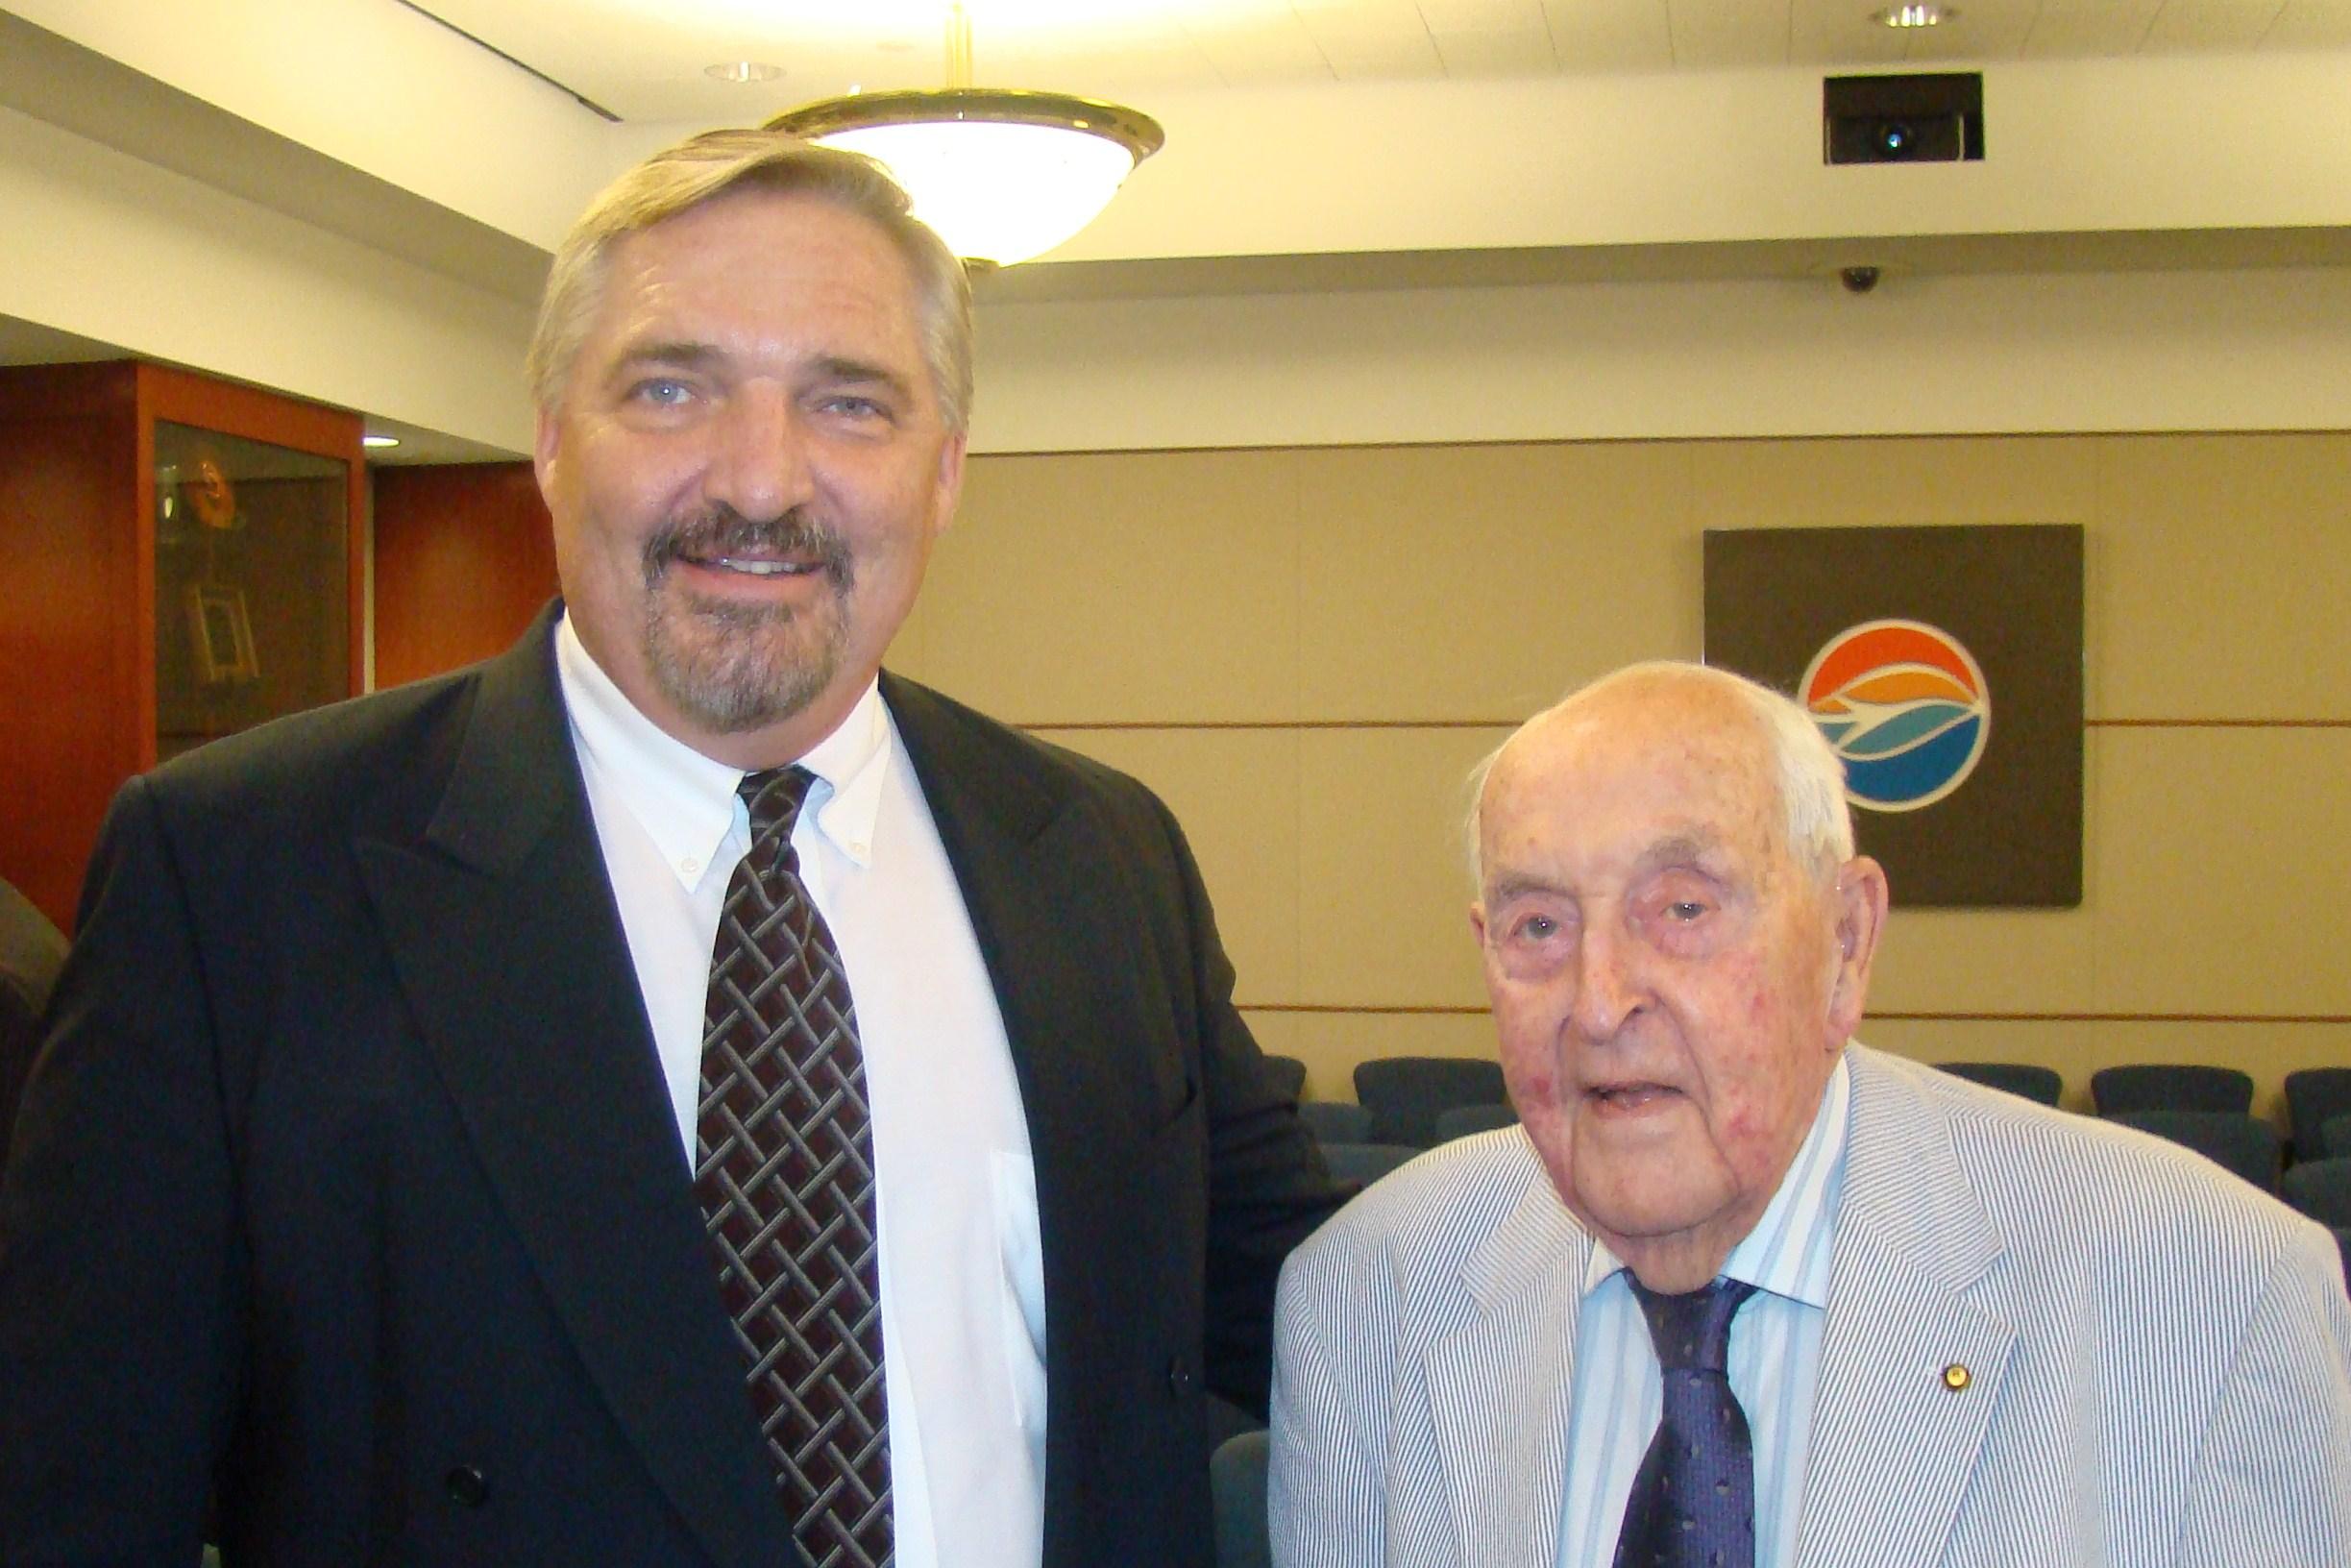 John Dahl & Sir Lenox, 27 Oct '11 - Copy.JPG